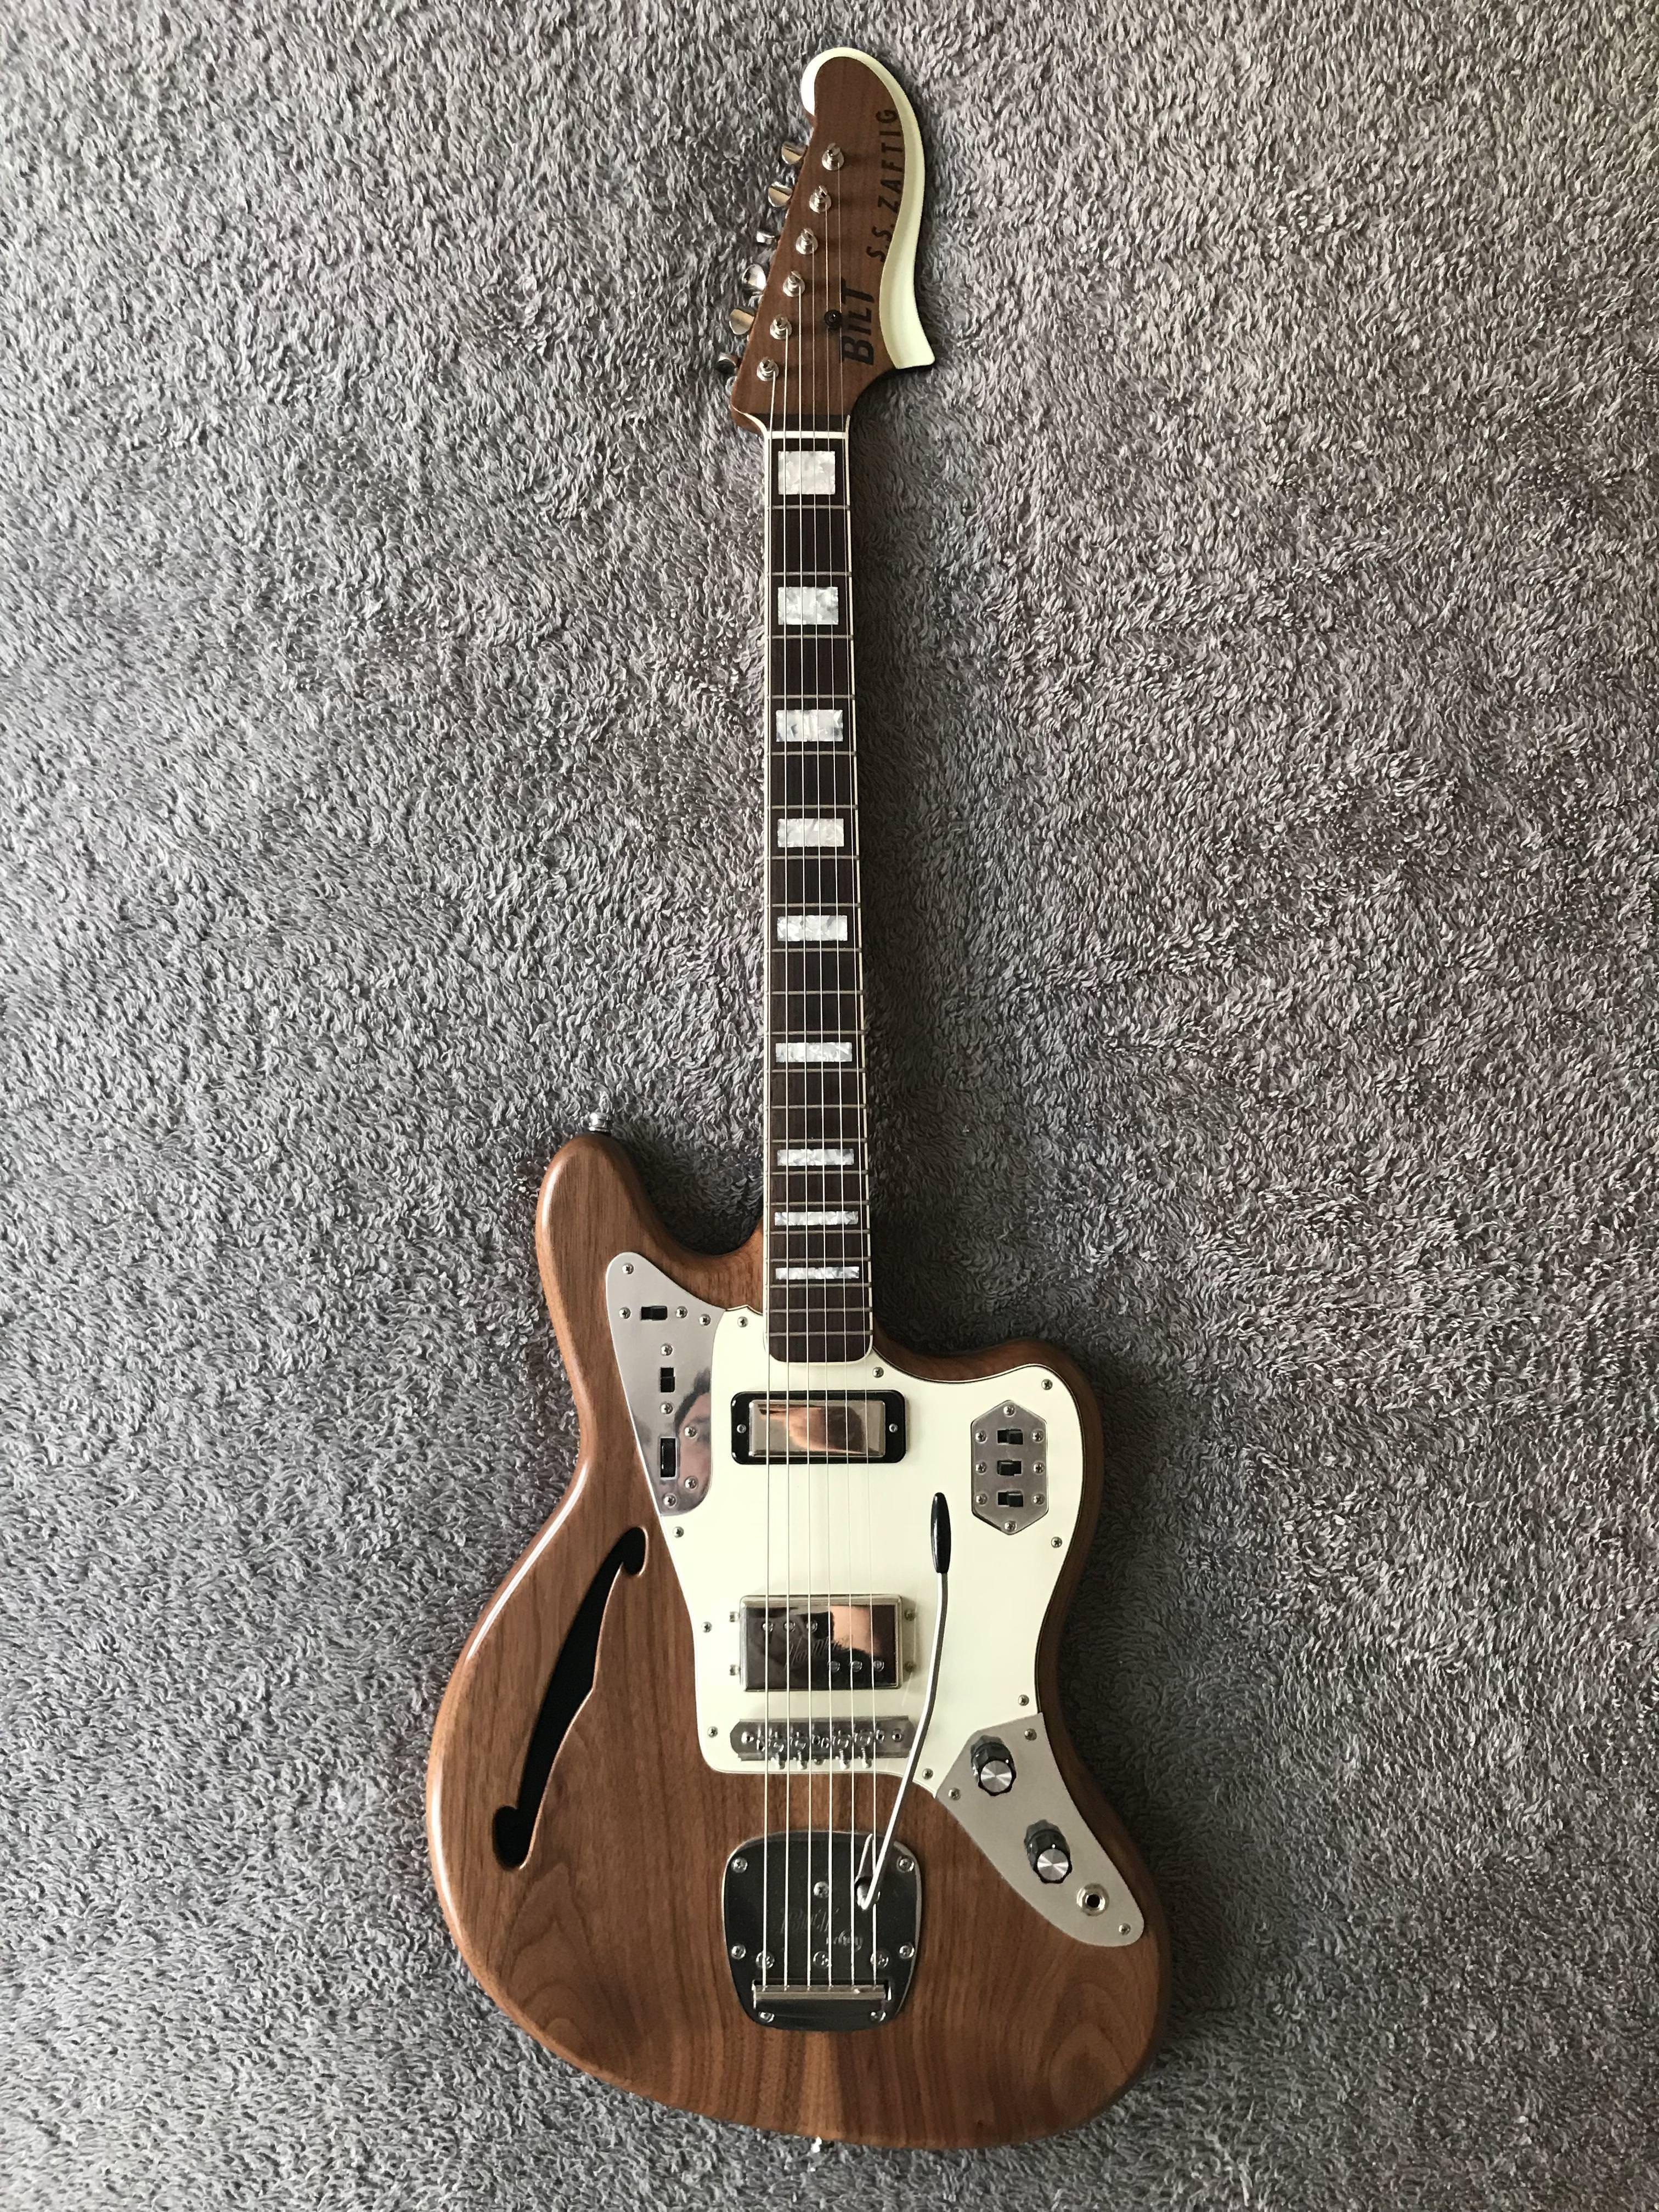 Bilt Zaftig | Electric guitars in 2019 | Fender guitars